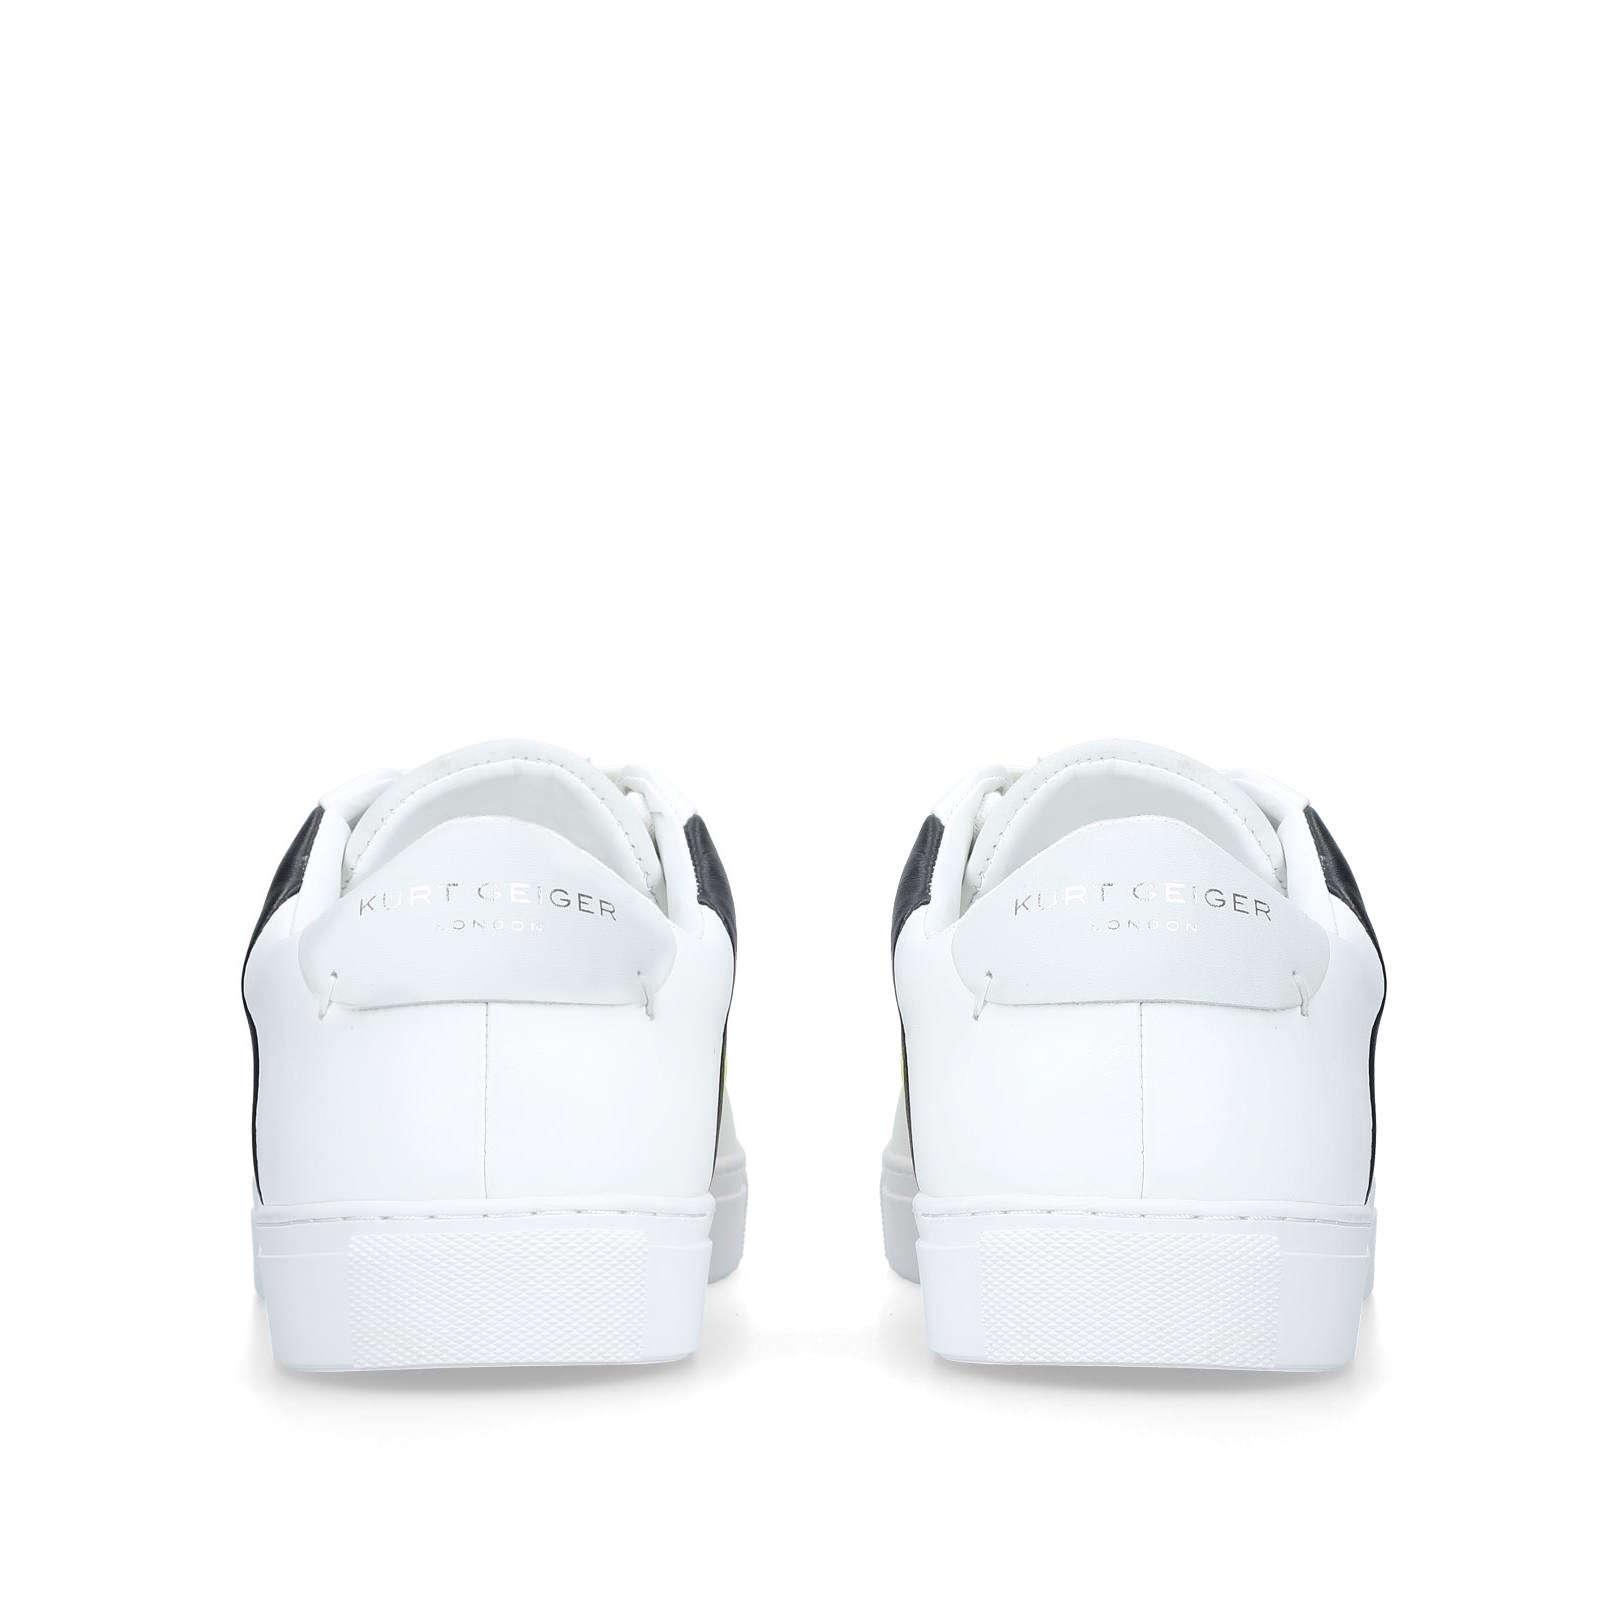 DONNIE STRIPE - KURT GEIGER LONDON Sneakers